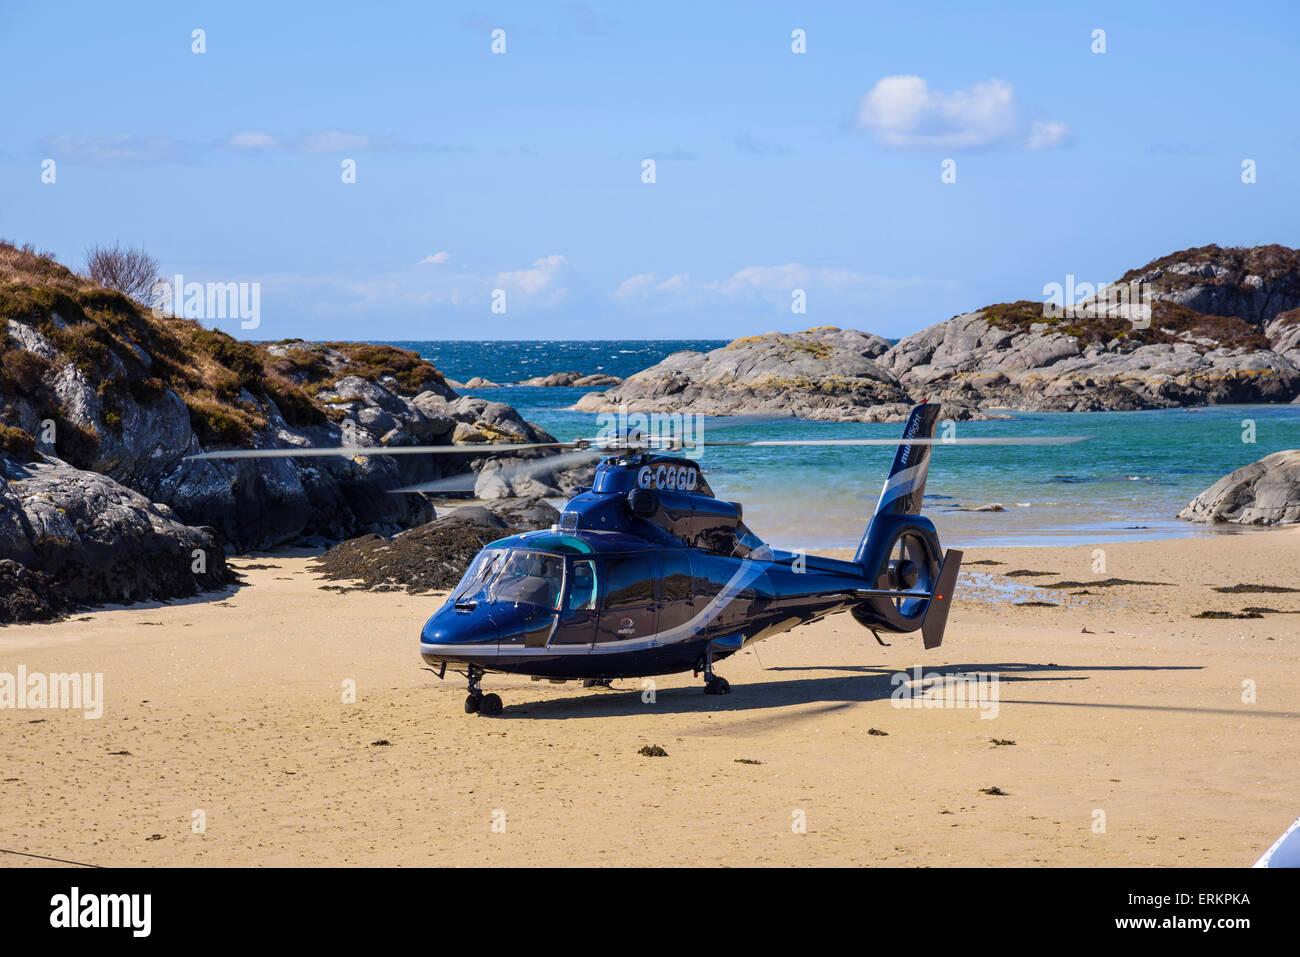 Helicopter landing on Ardtoe beach, Ardnamurchan Peninsula, Lochaber, Highlands, Scotland - Stock Image